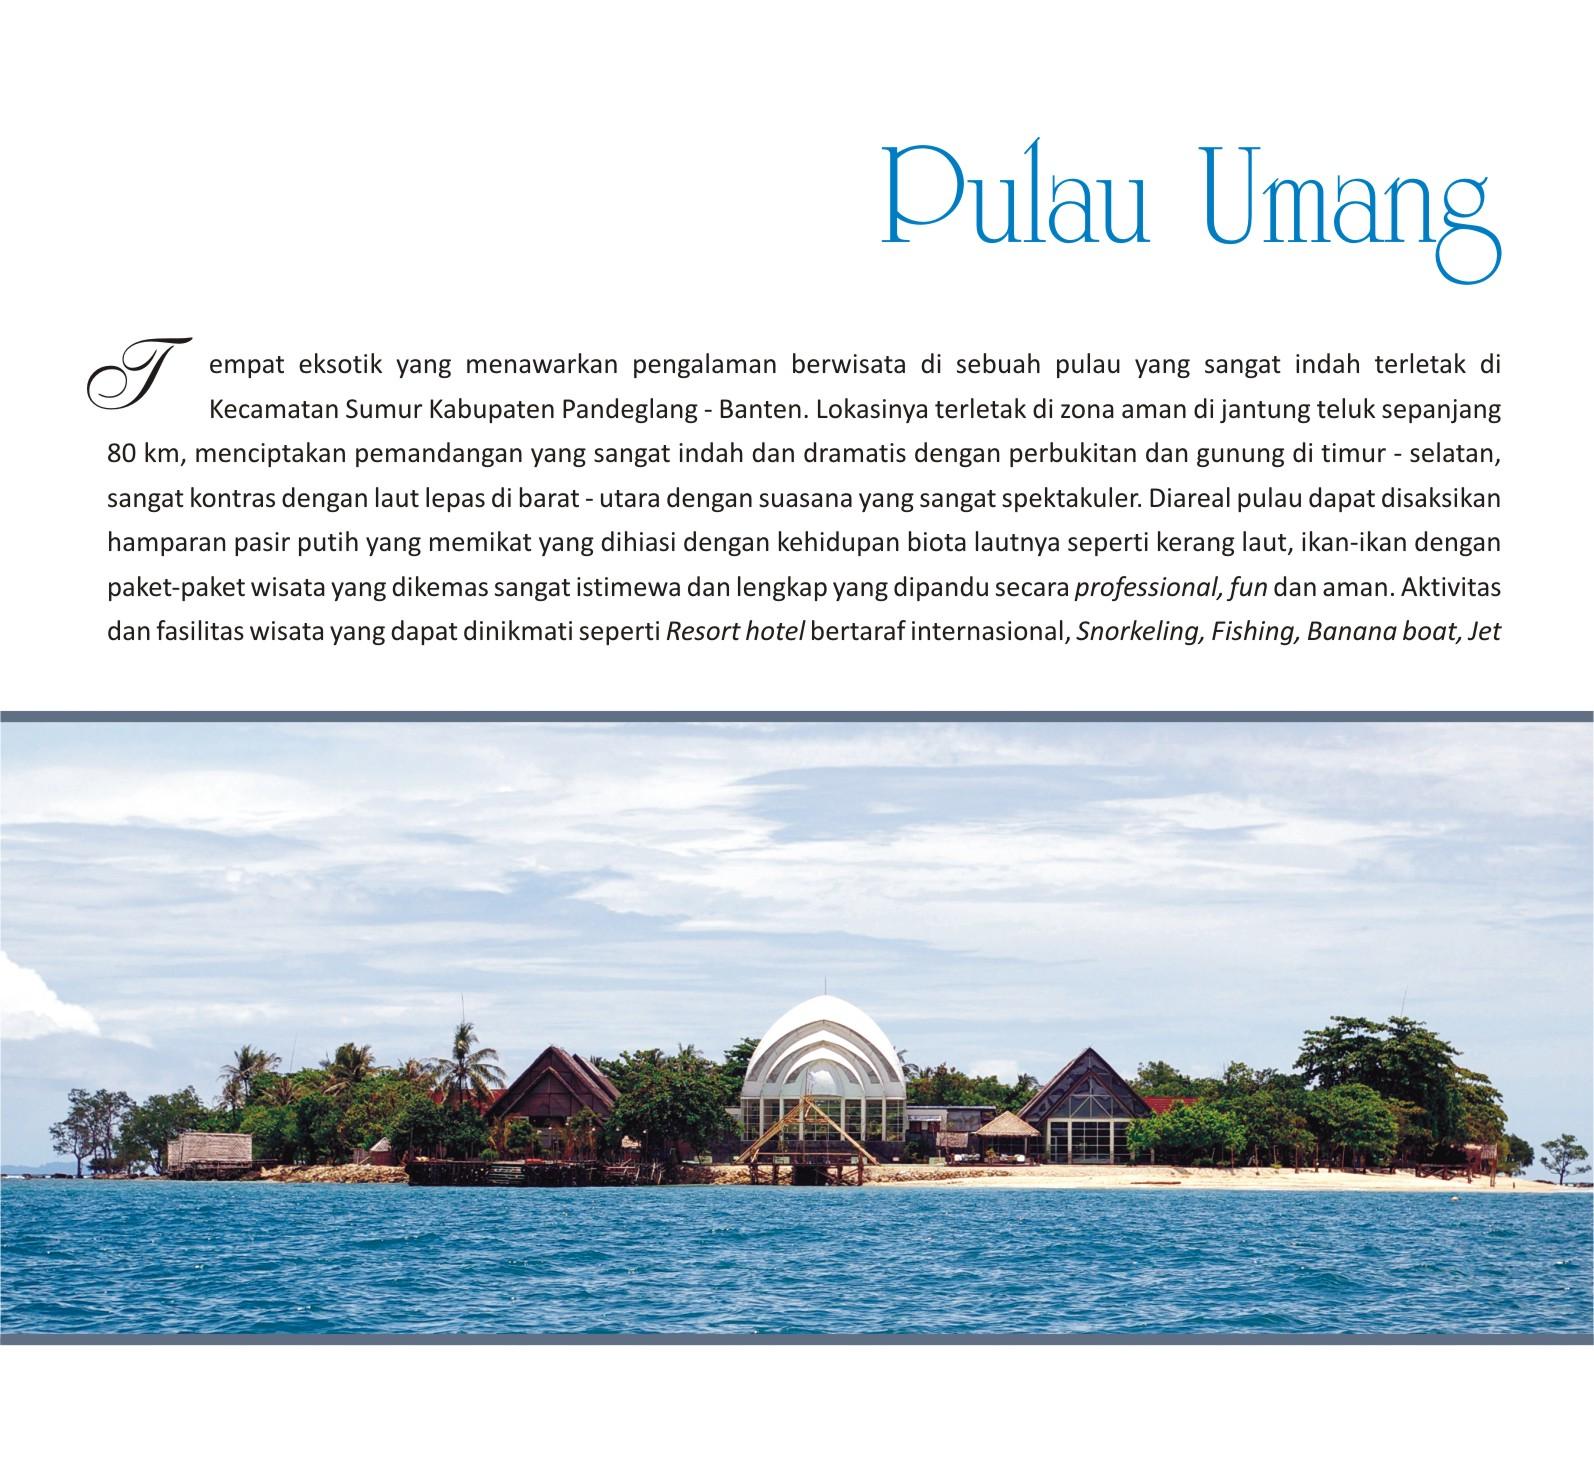 Pesona Wisata Pantai Pandeglang Kenali Daerah Cintai Negeri Pulau Umang